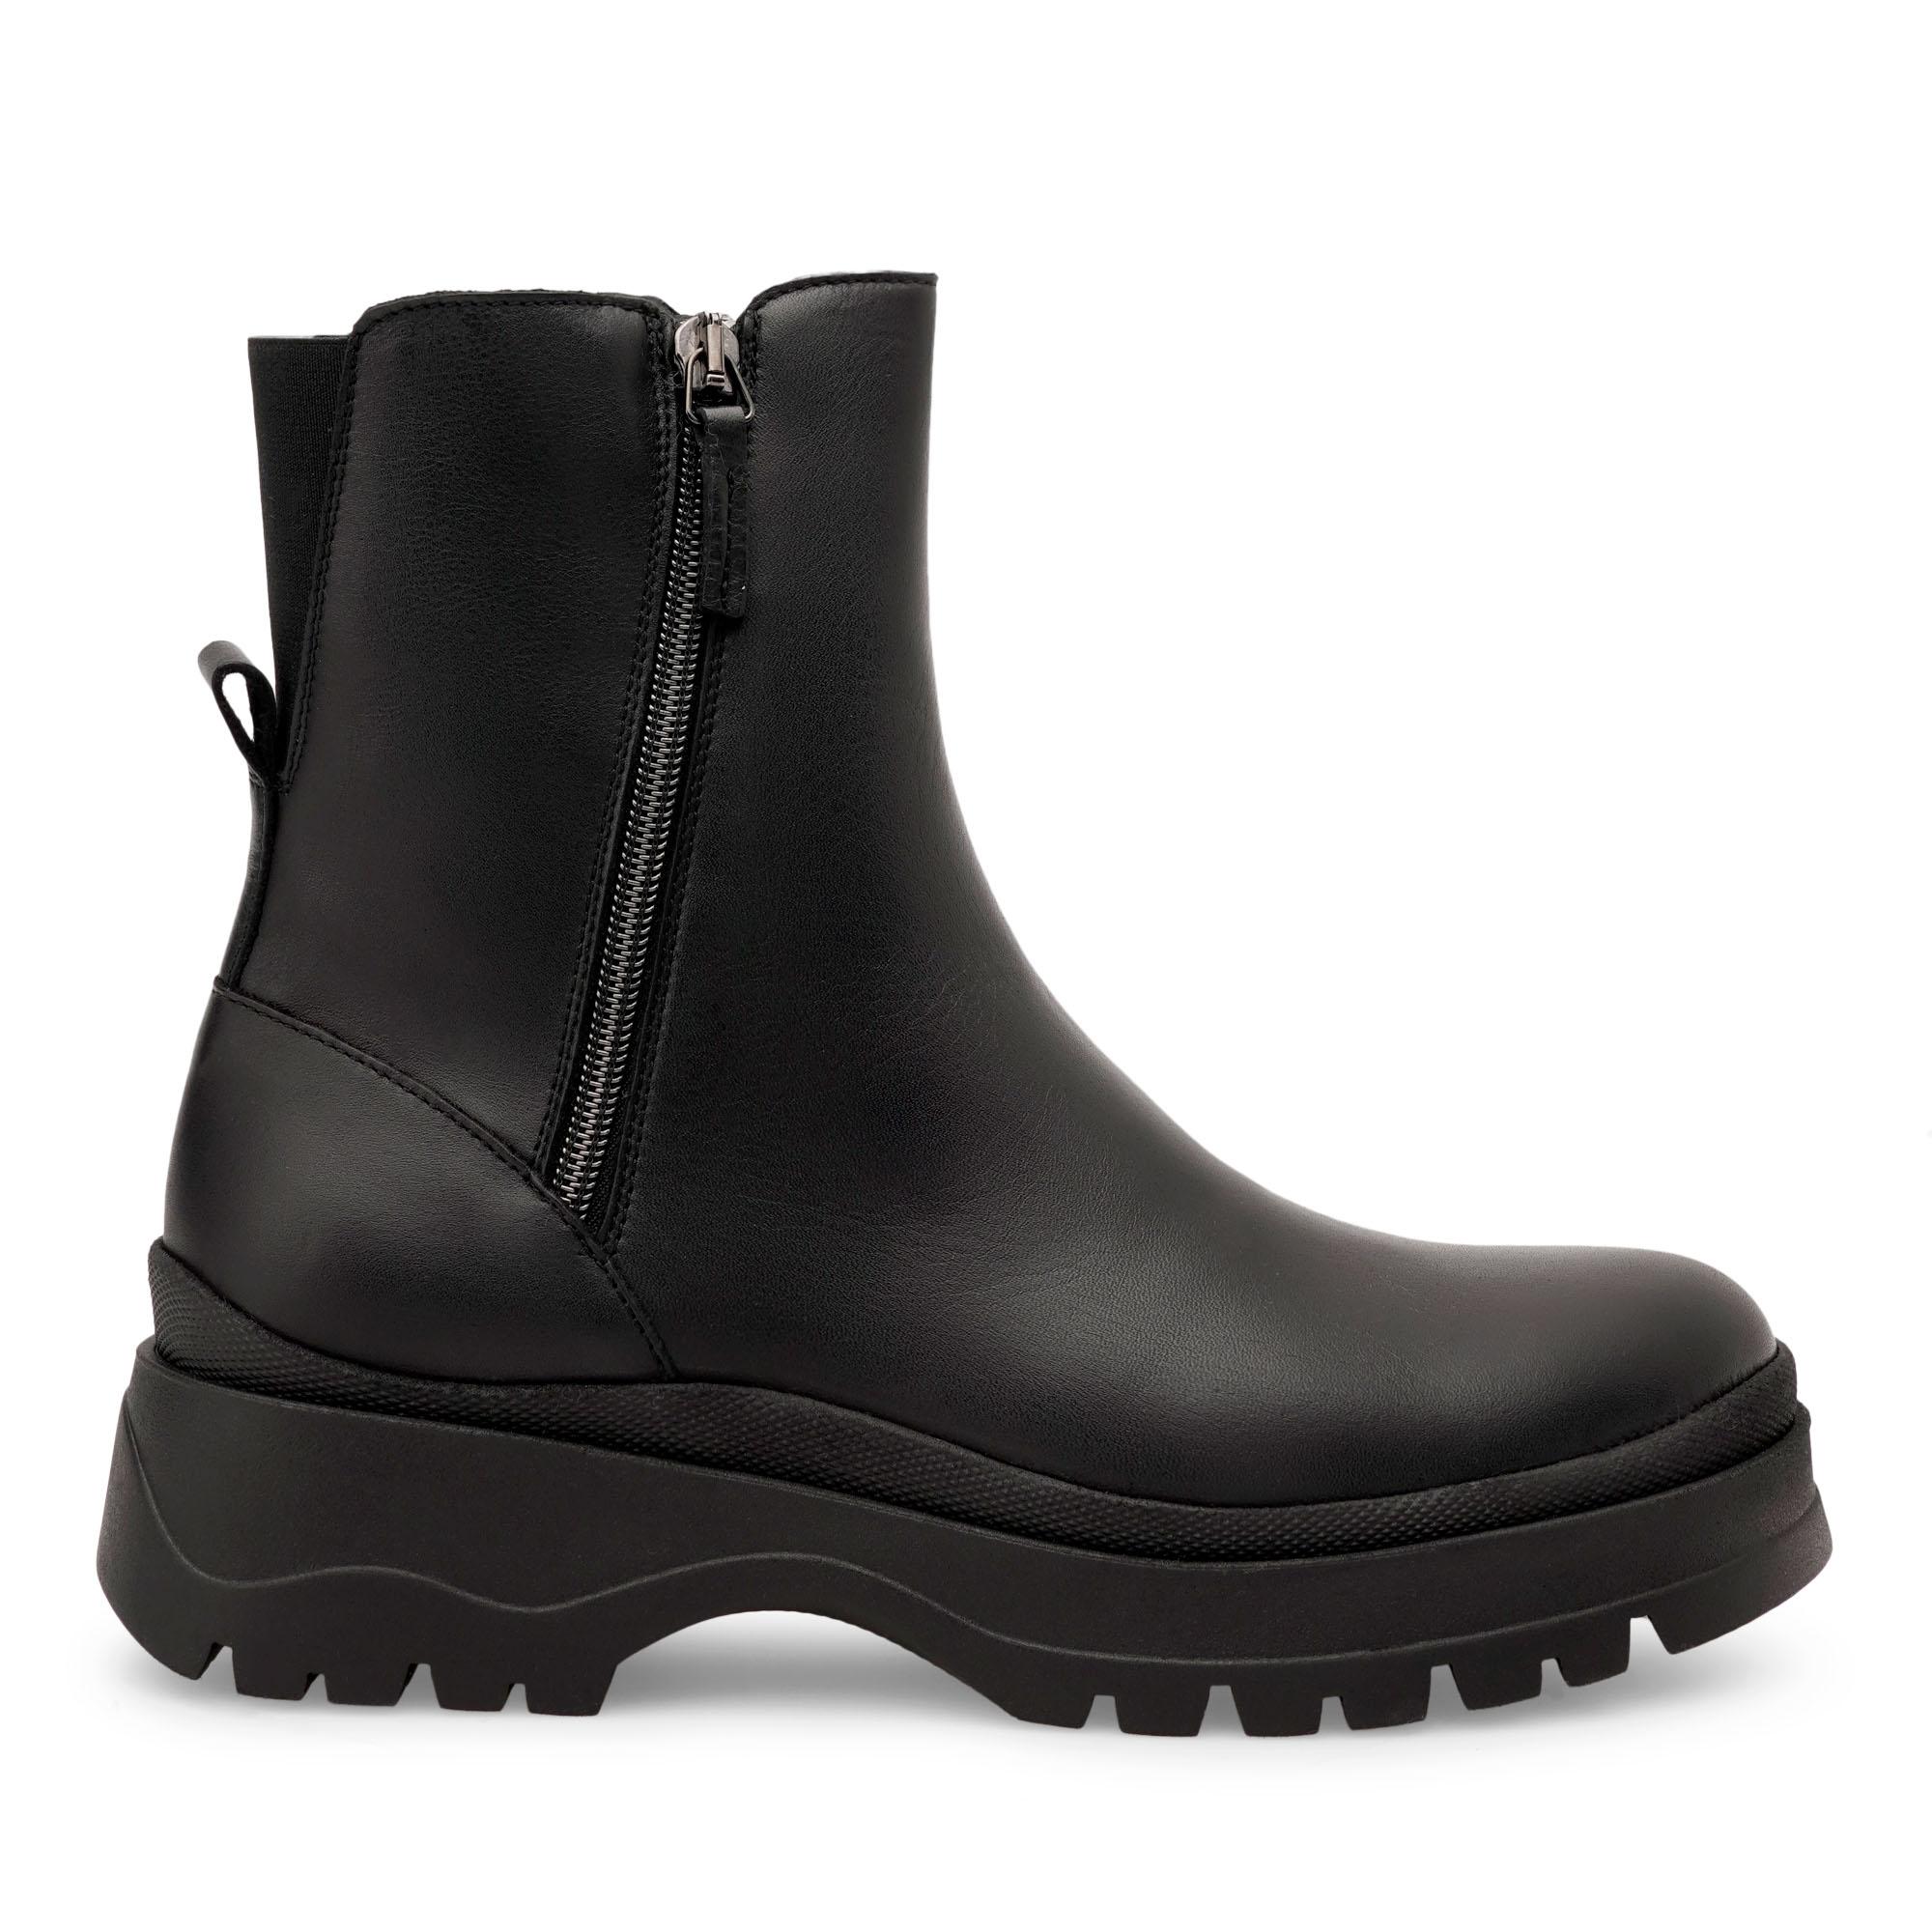 noemi_linea-nera-emanuela-passeri-scarpe